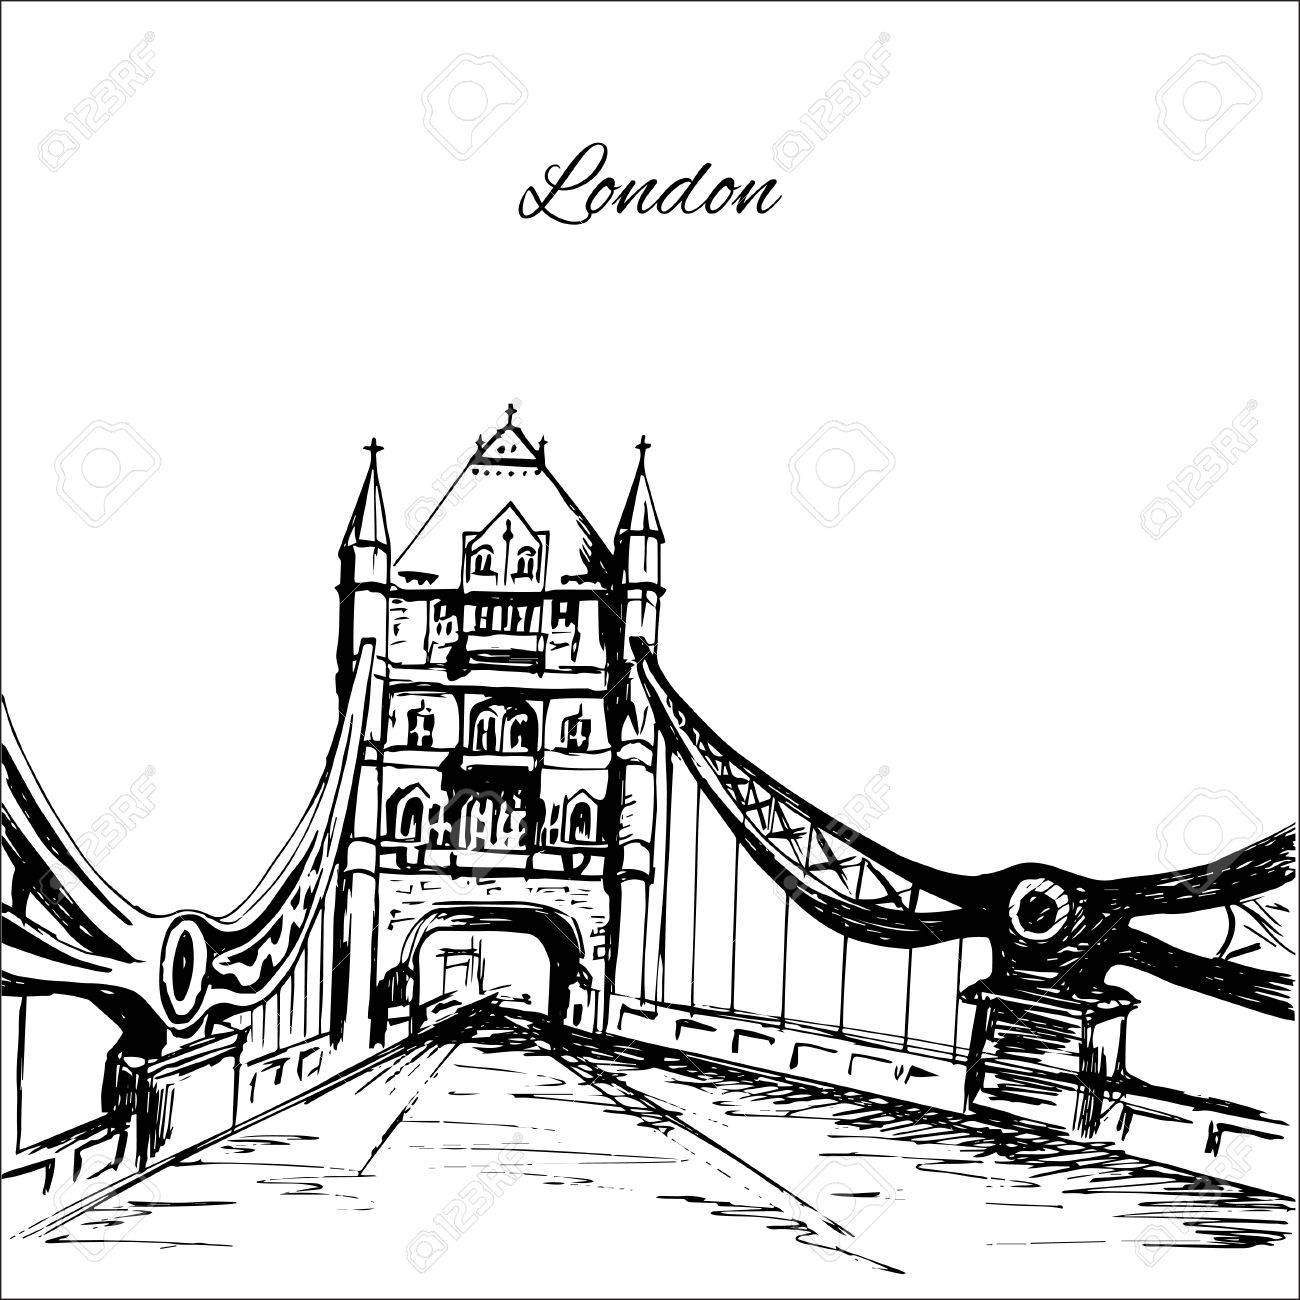 1300x1300 Hand Drawn London Tower Bridge Royalty Free Cliparts, Vectors,